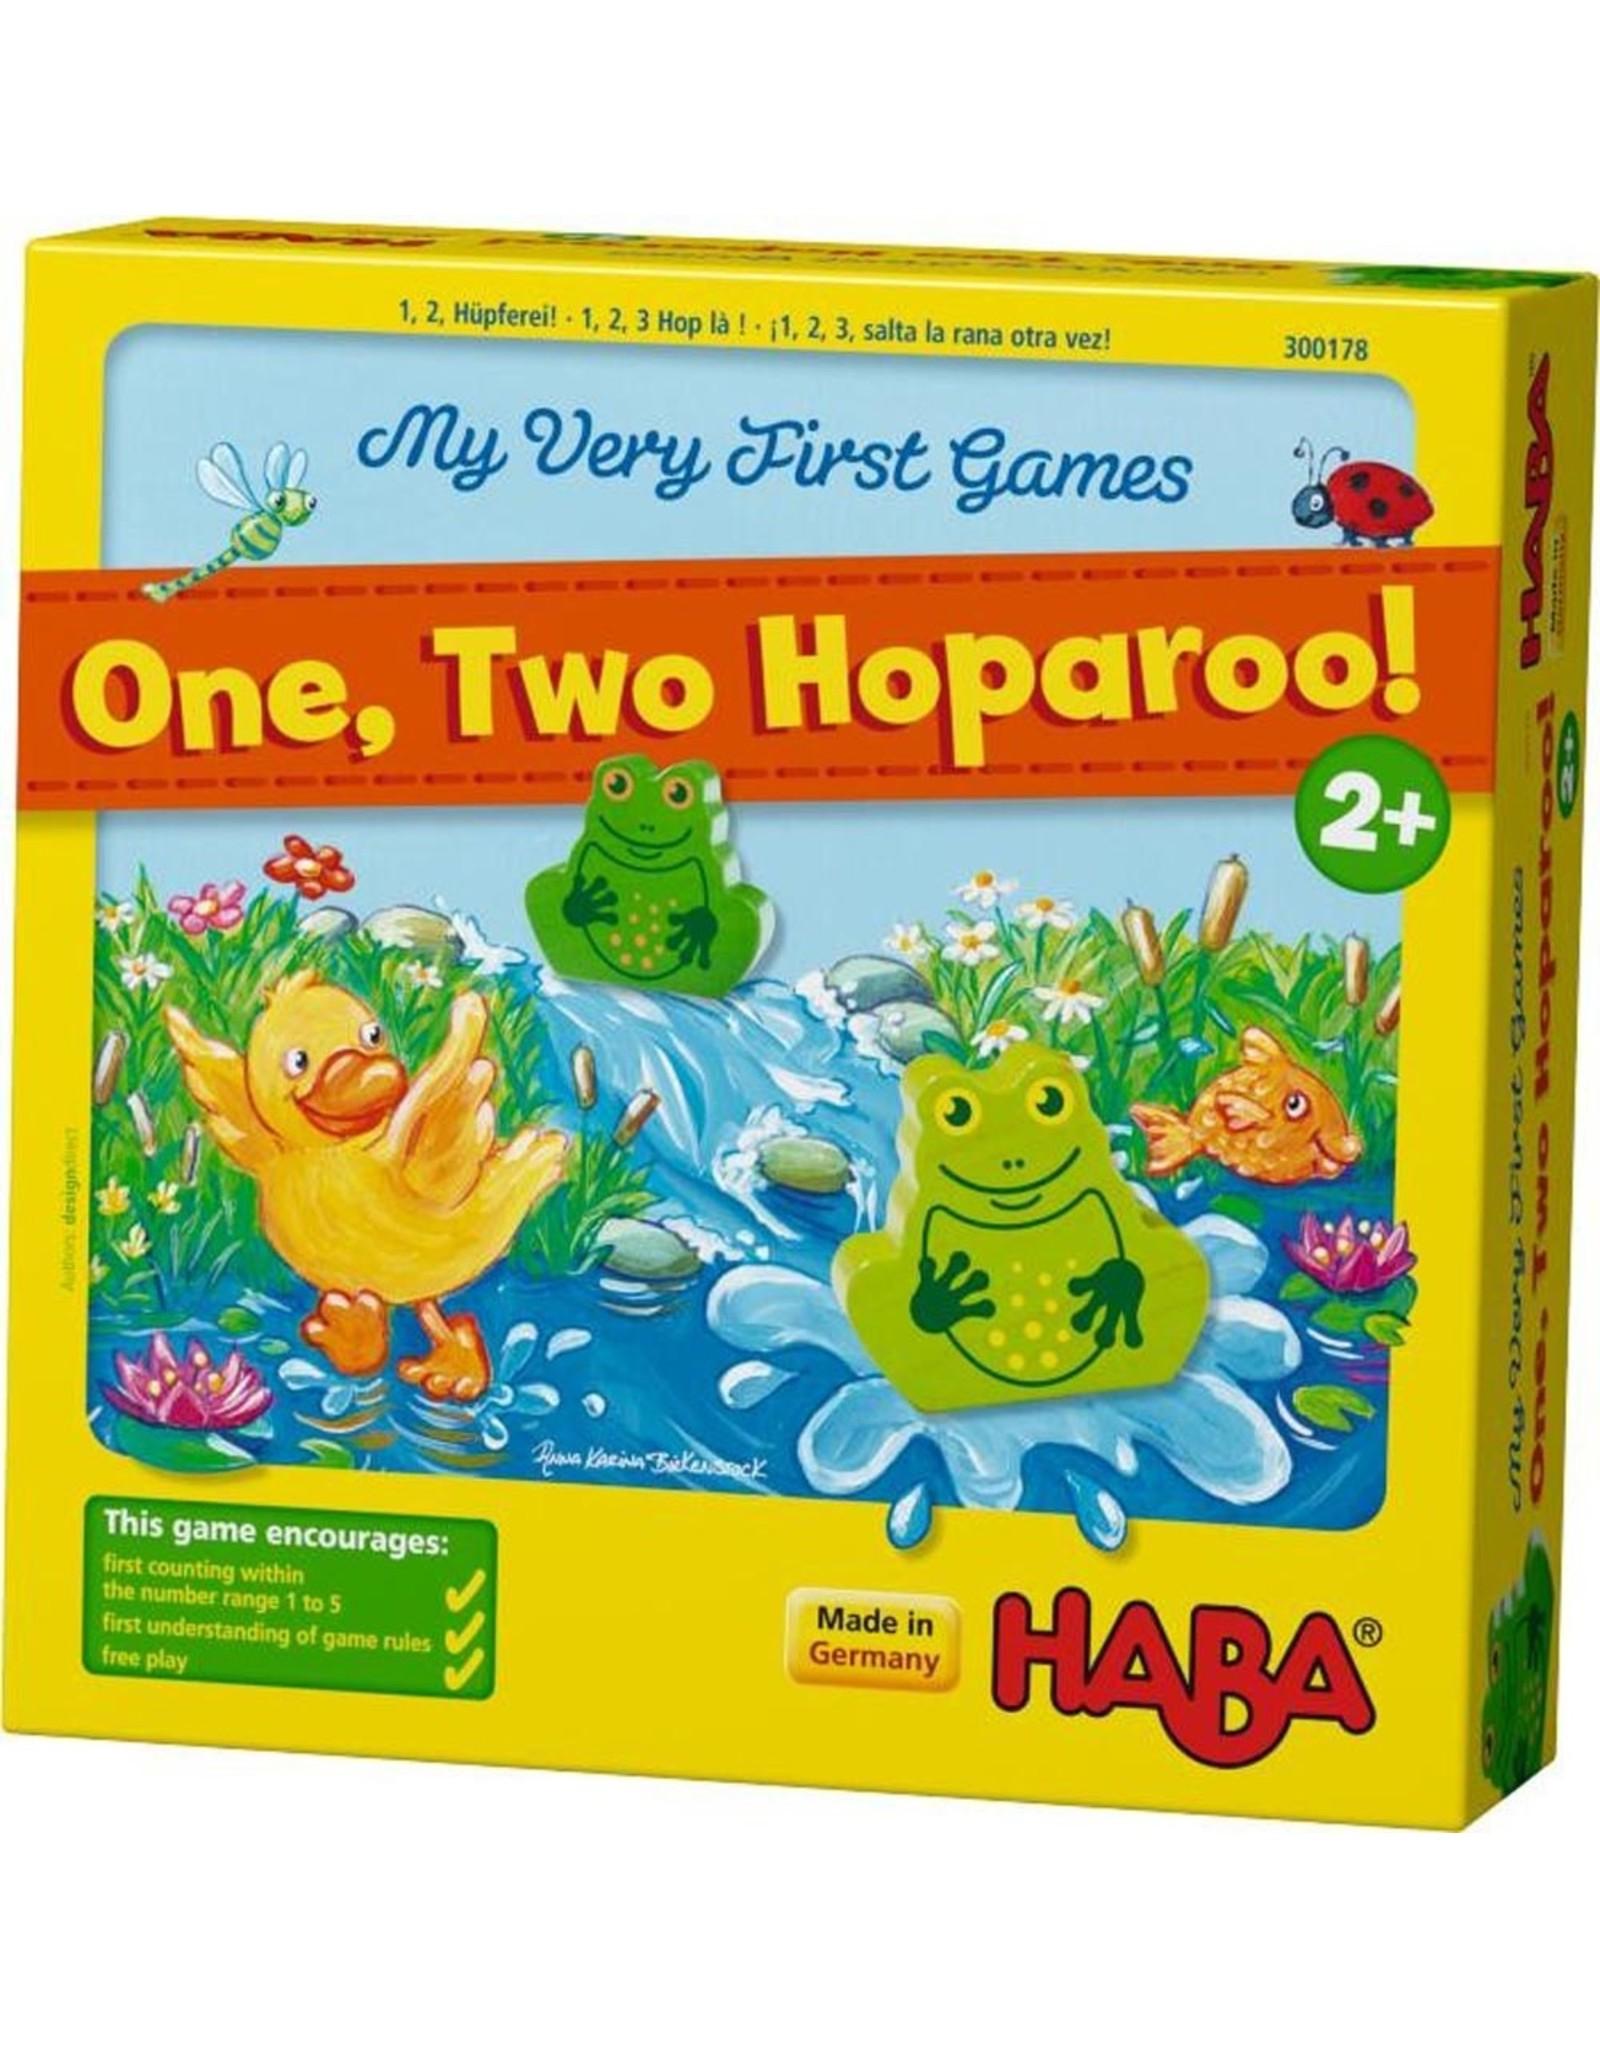 One, Two Hoparoo!